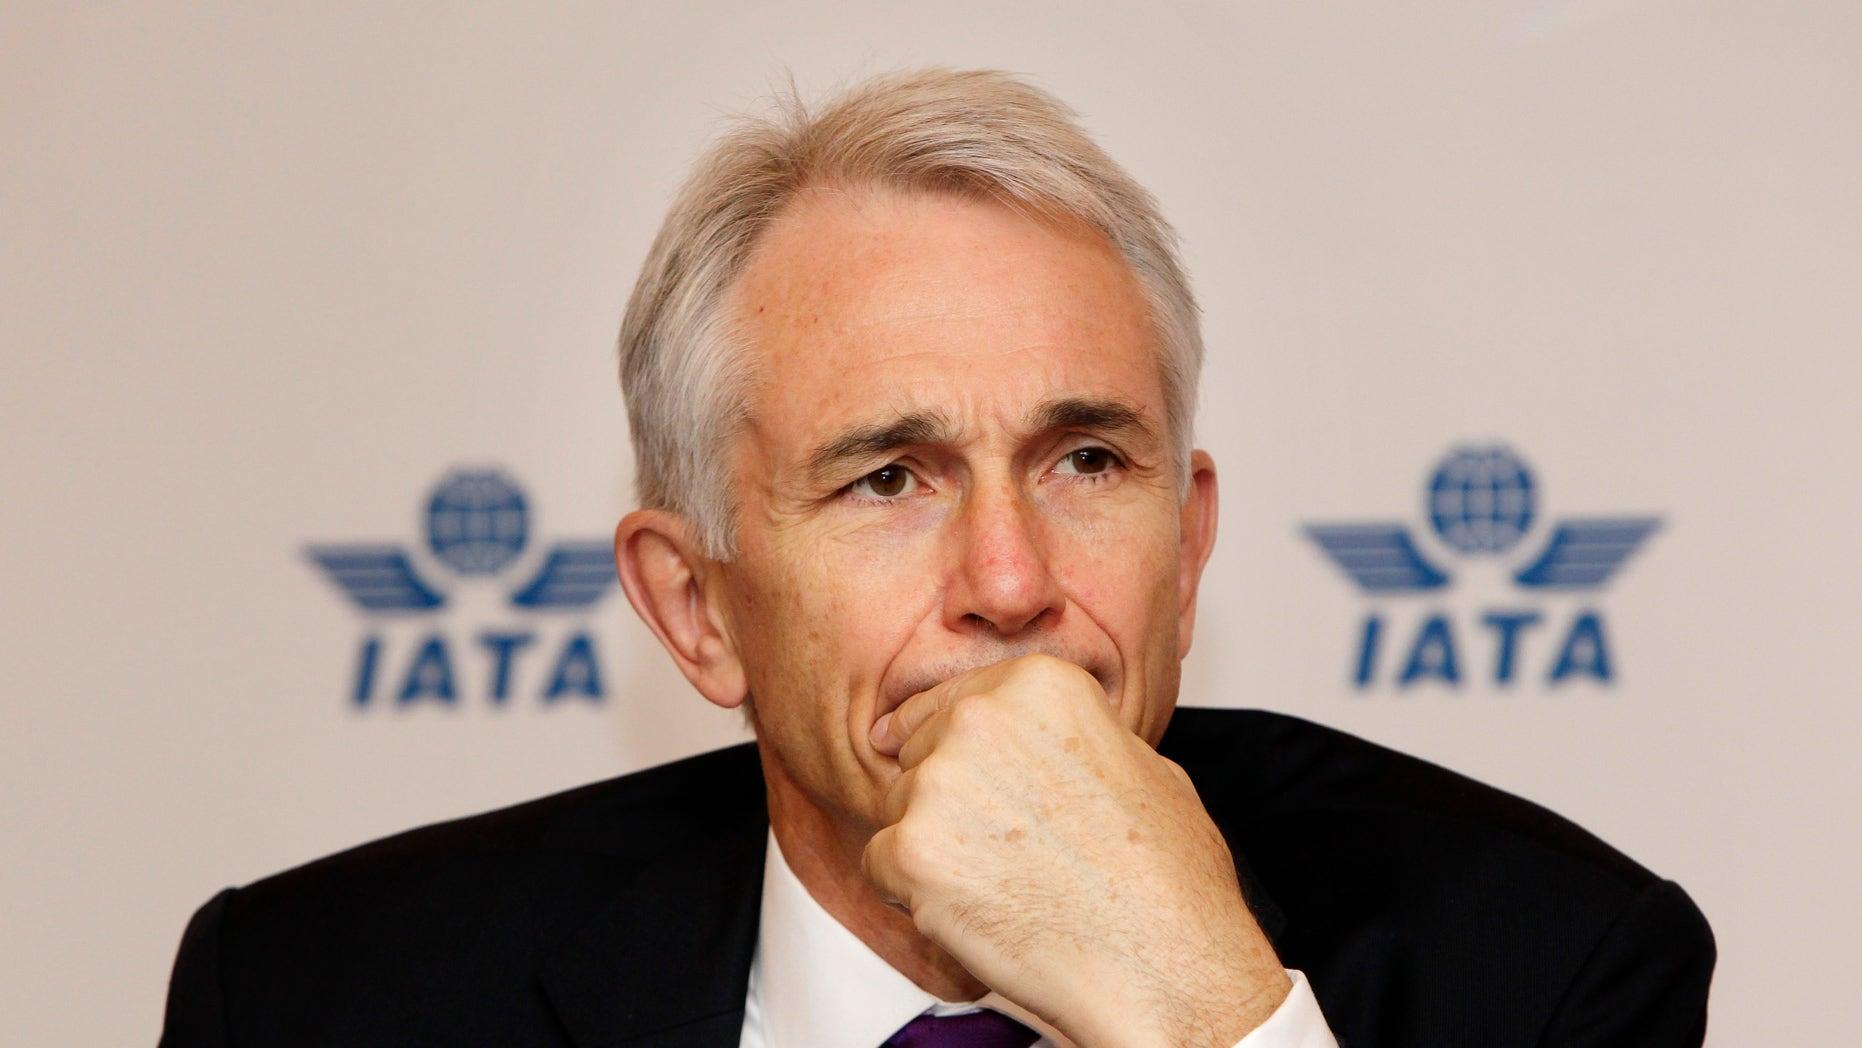 International Air Transport Association (IATA) director general Tony Tyler REUTERS/Jason Lee